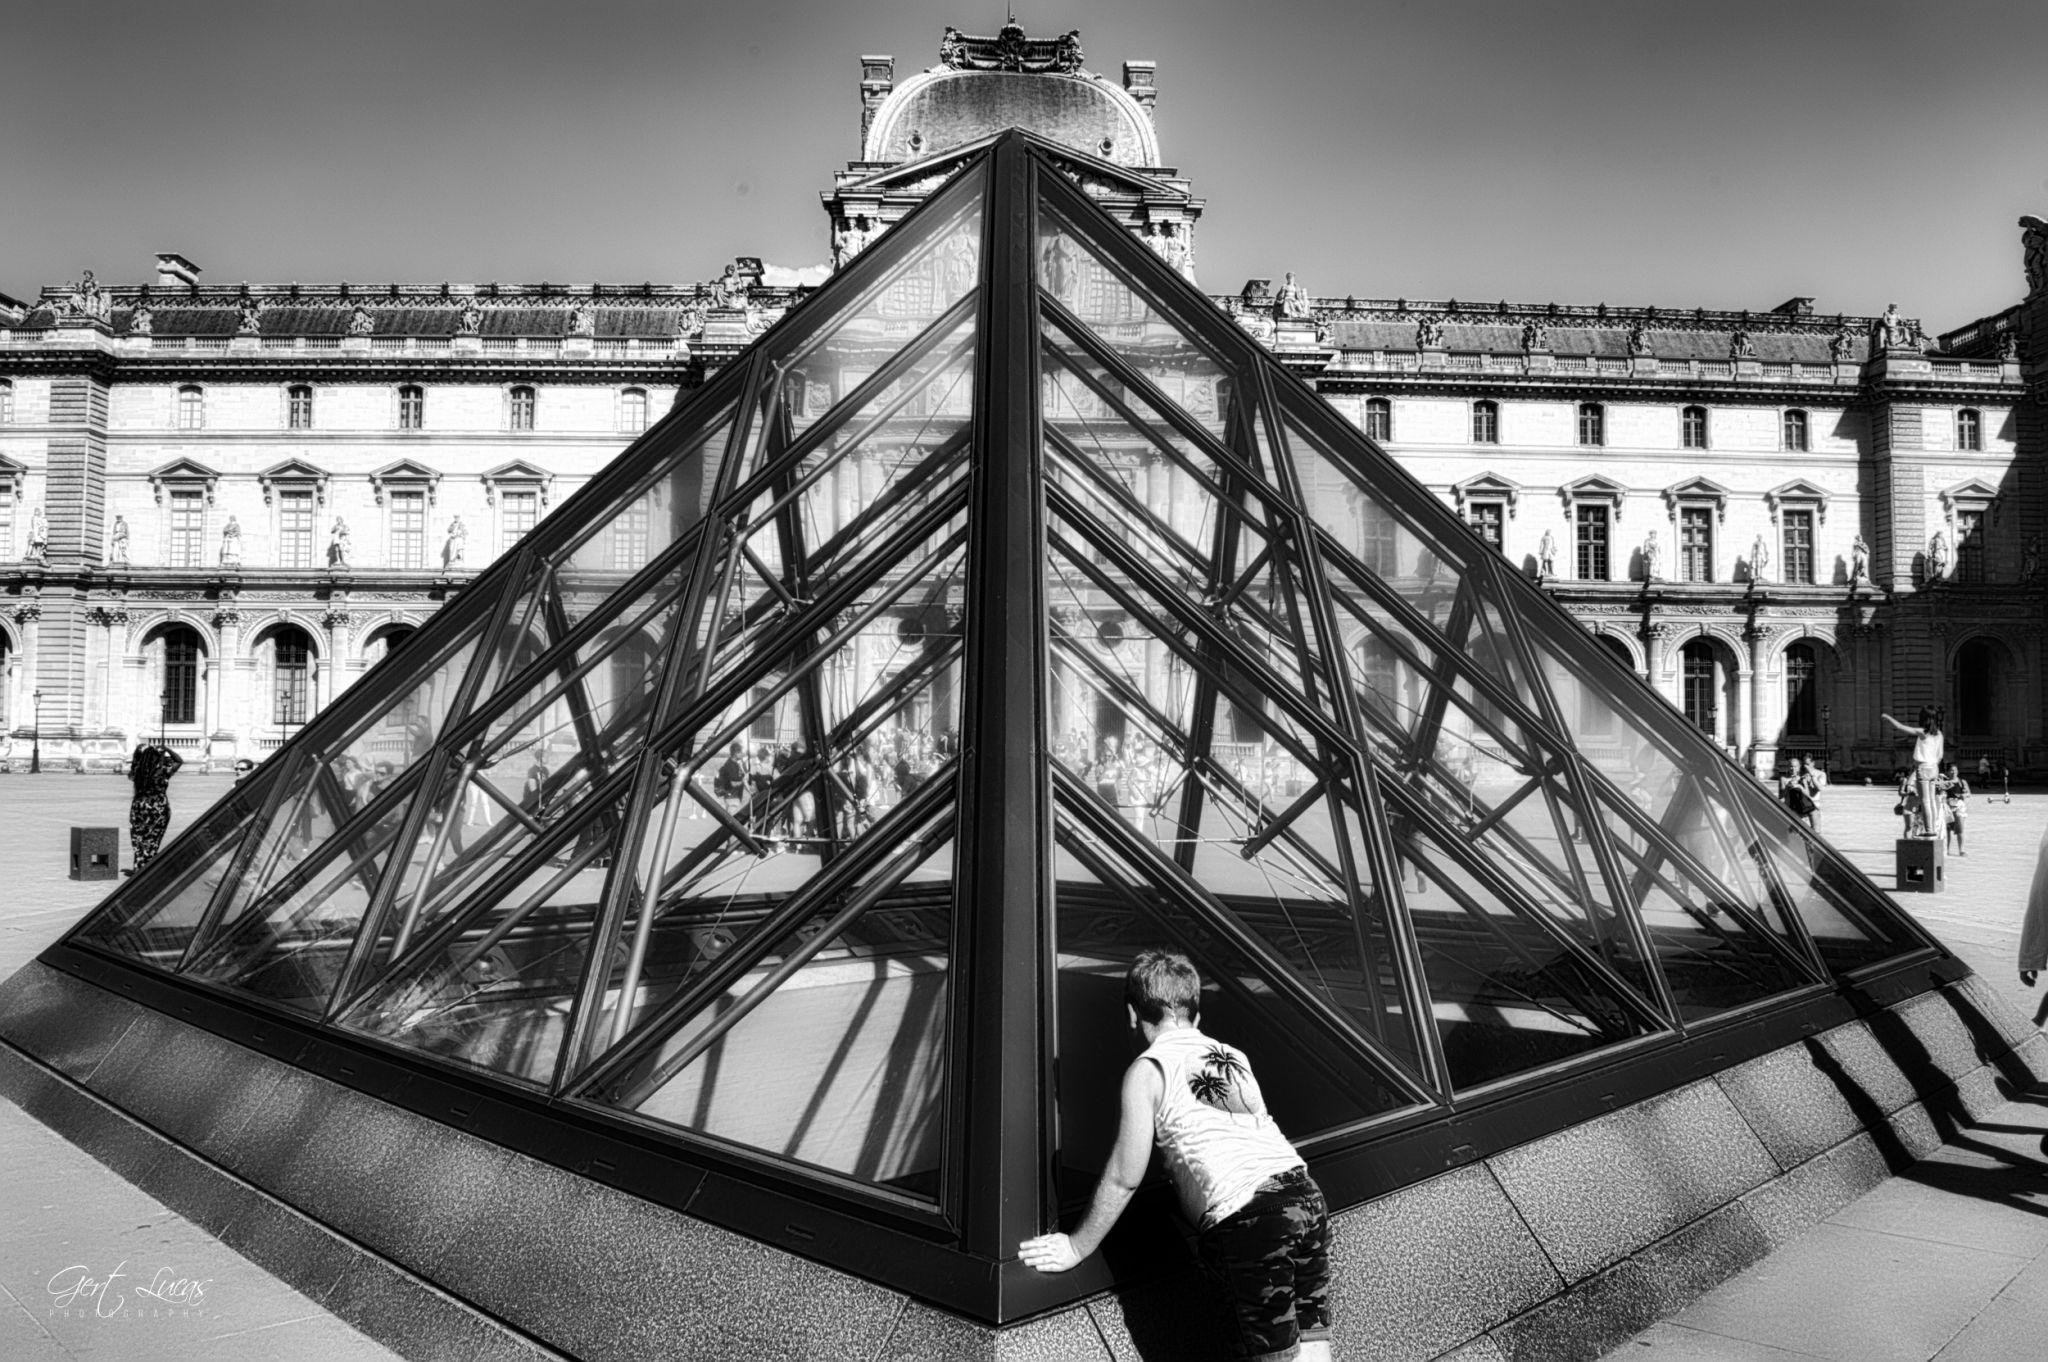 Louvre curiousity, France